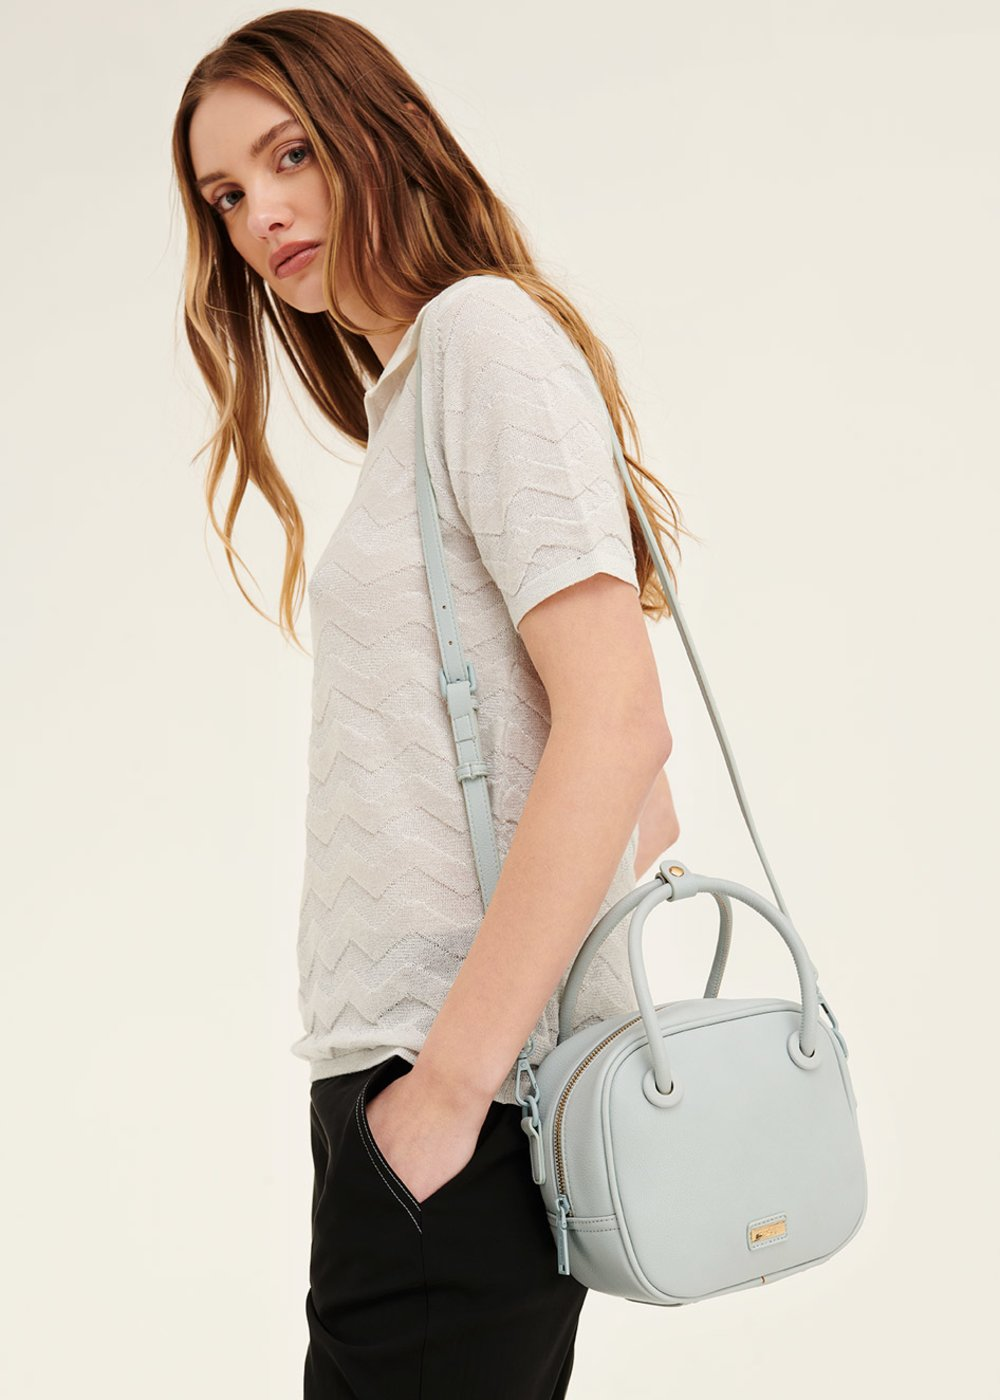 Berry shoulder bag with tubular handles - Blue sky - Woman